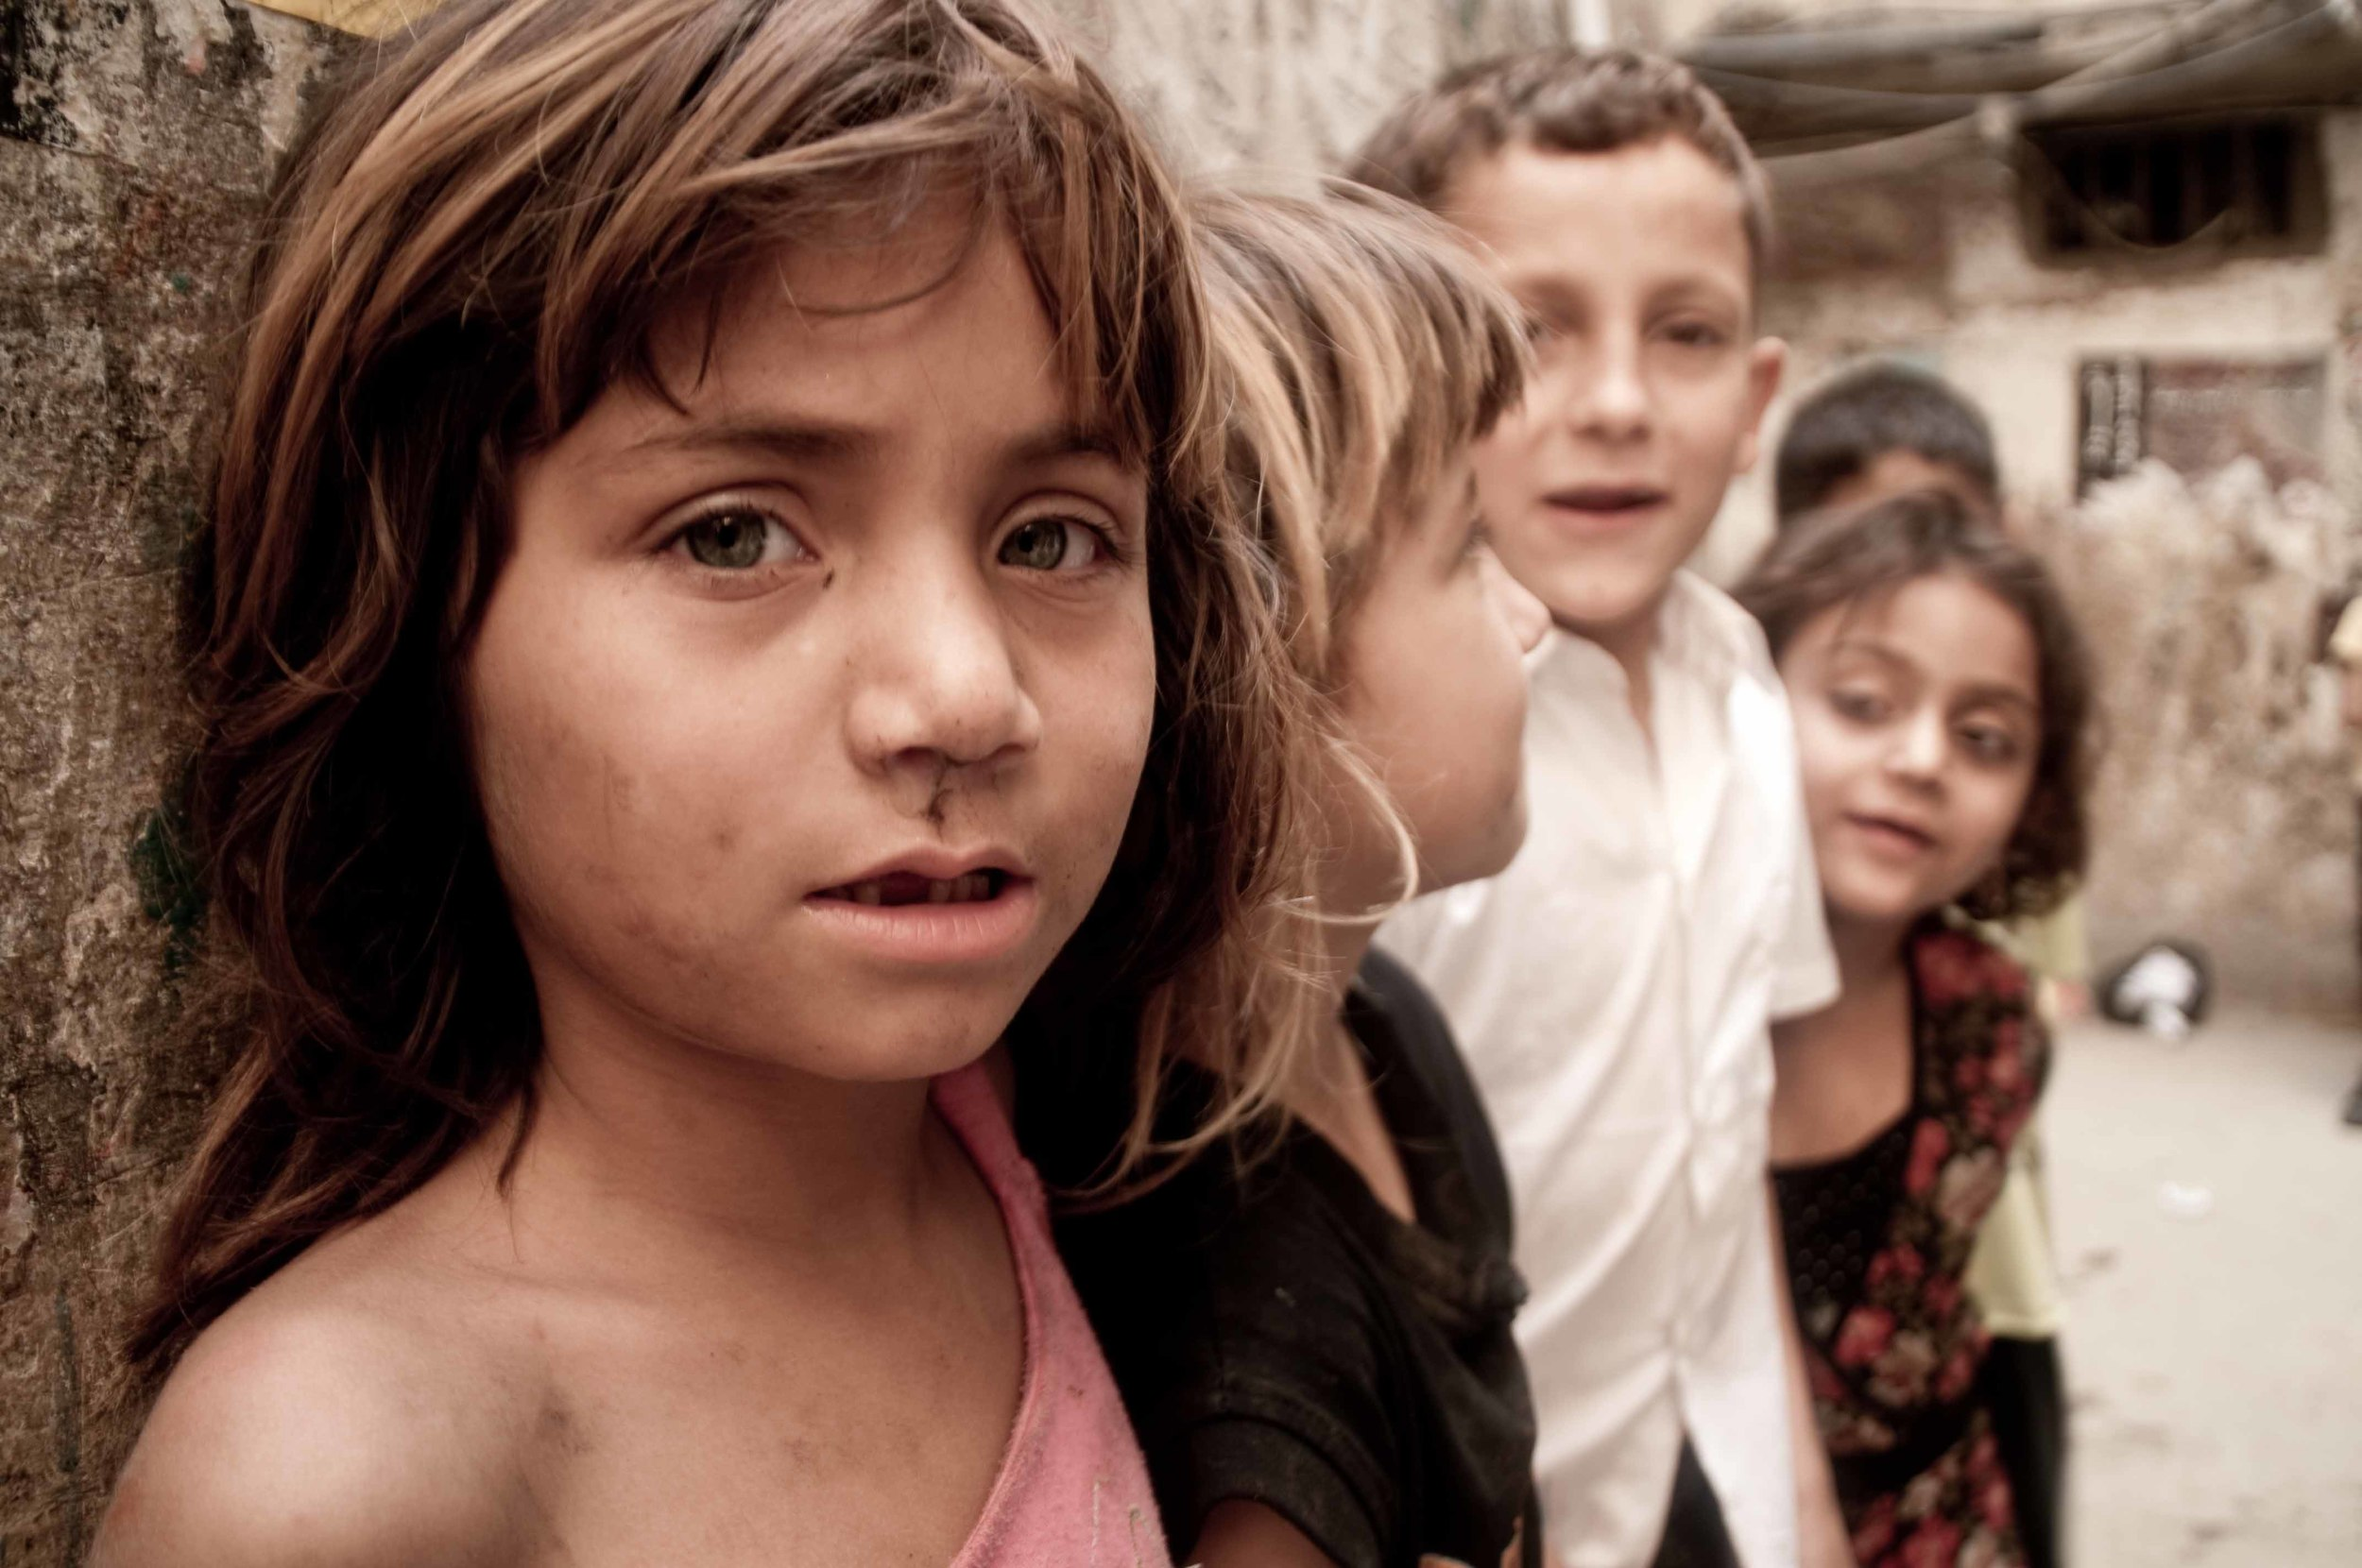 Lebanon_878.jpg